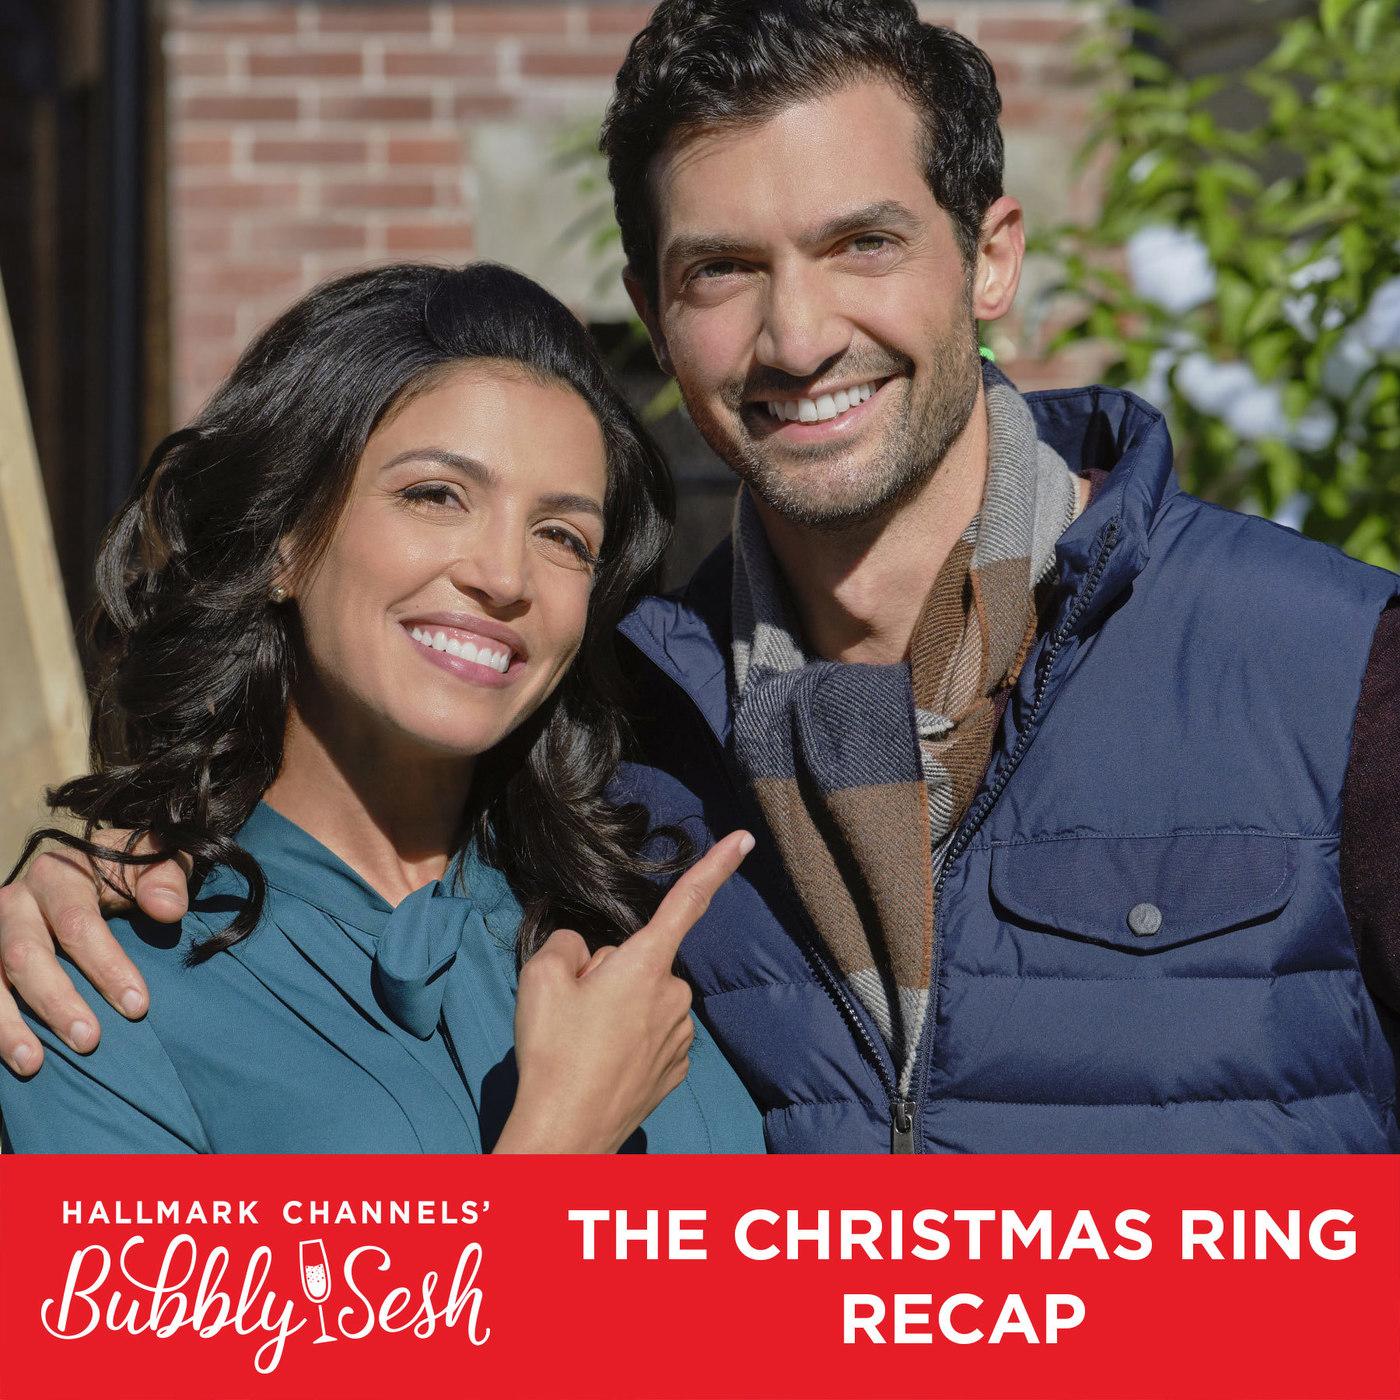 The Christmas Ring Recap